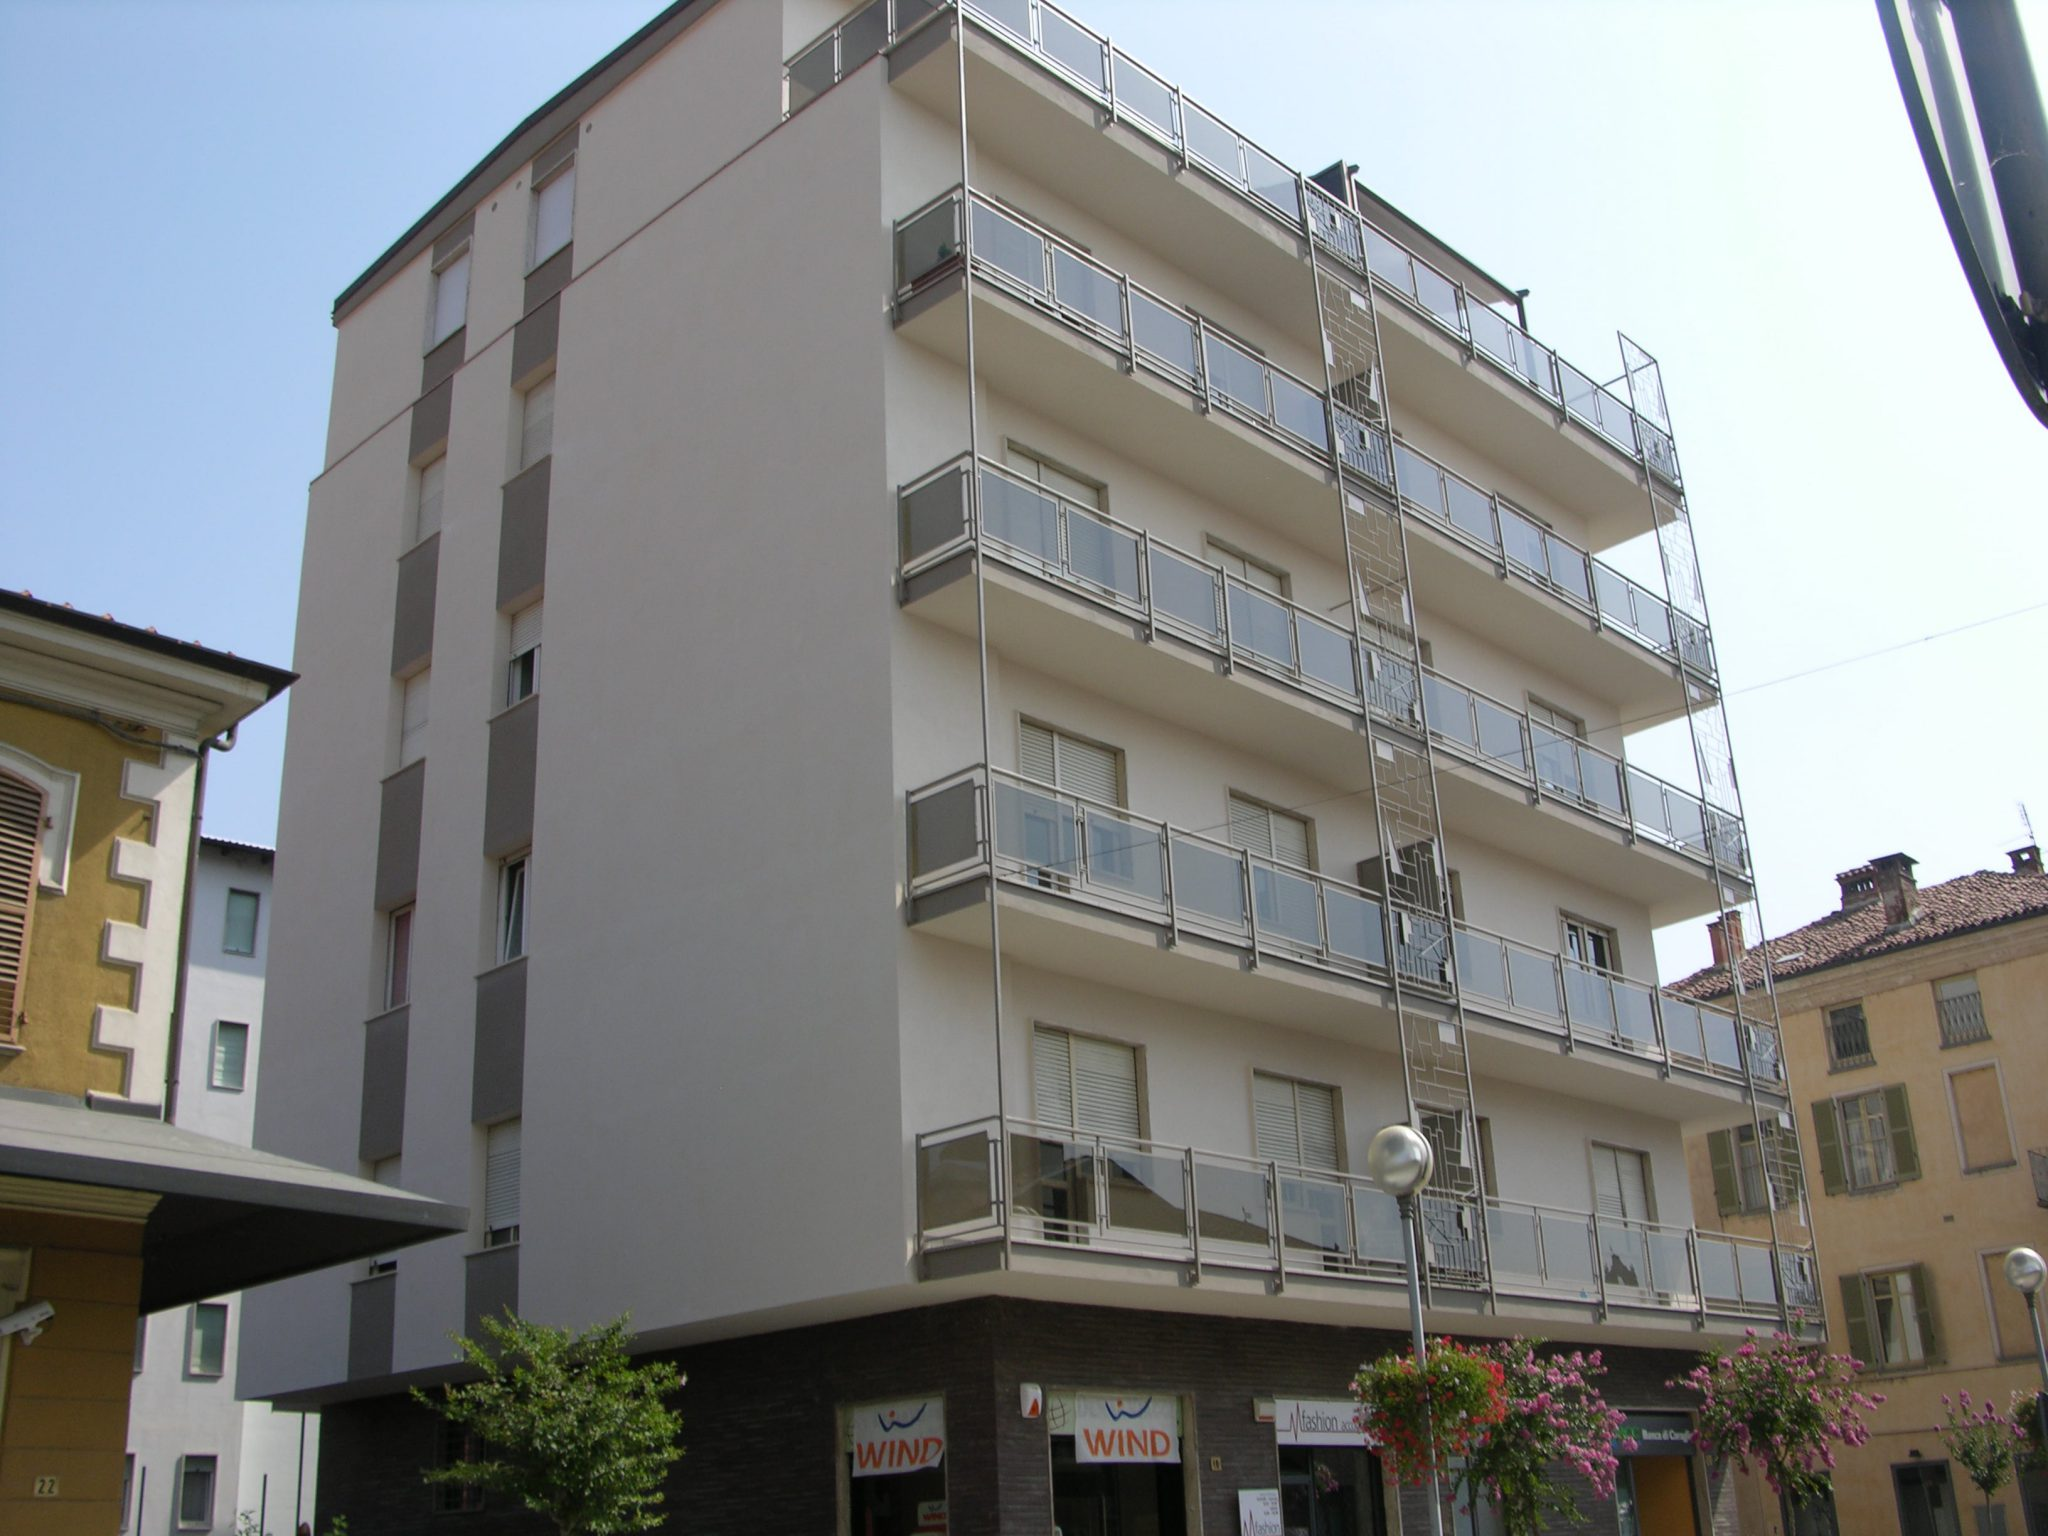 Via Saluzzo